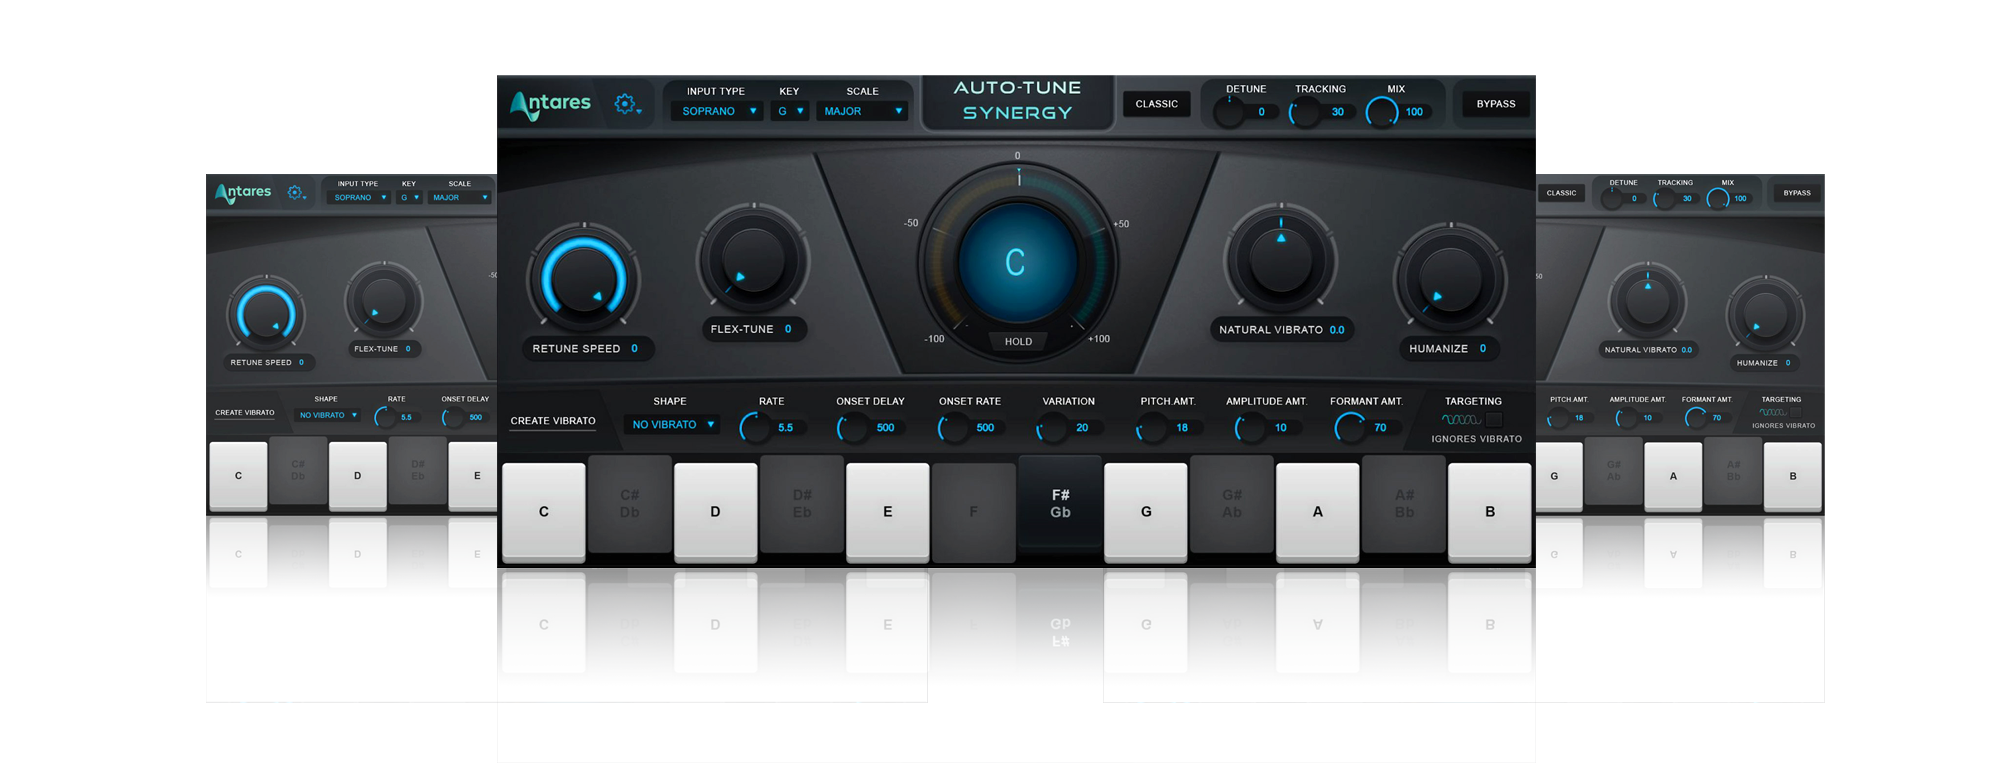 Auto Tune Synergy interface